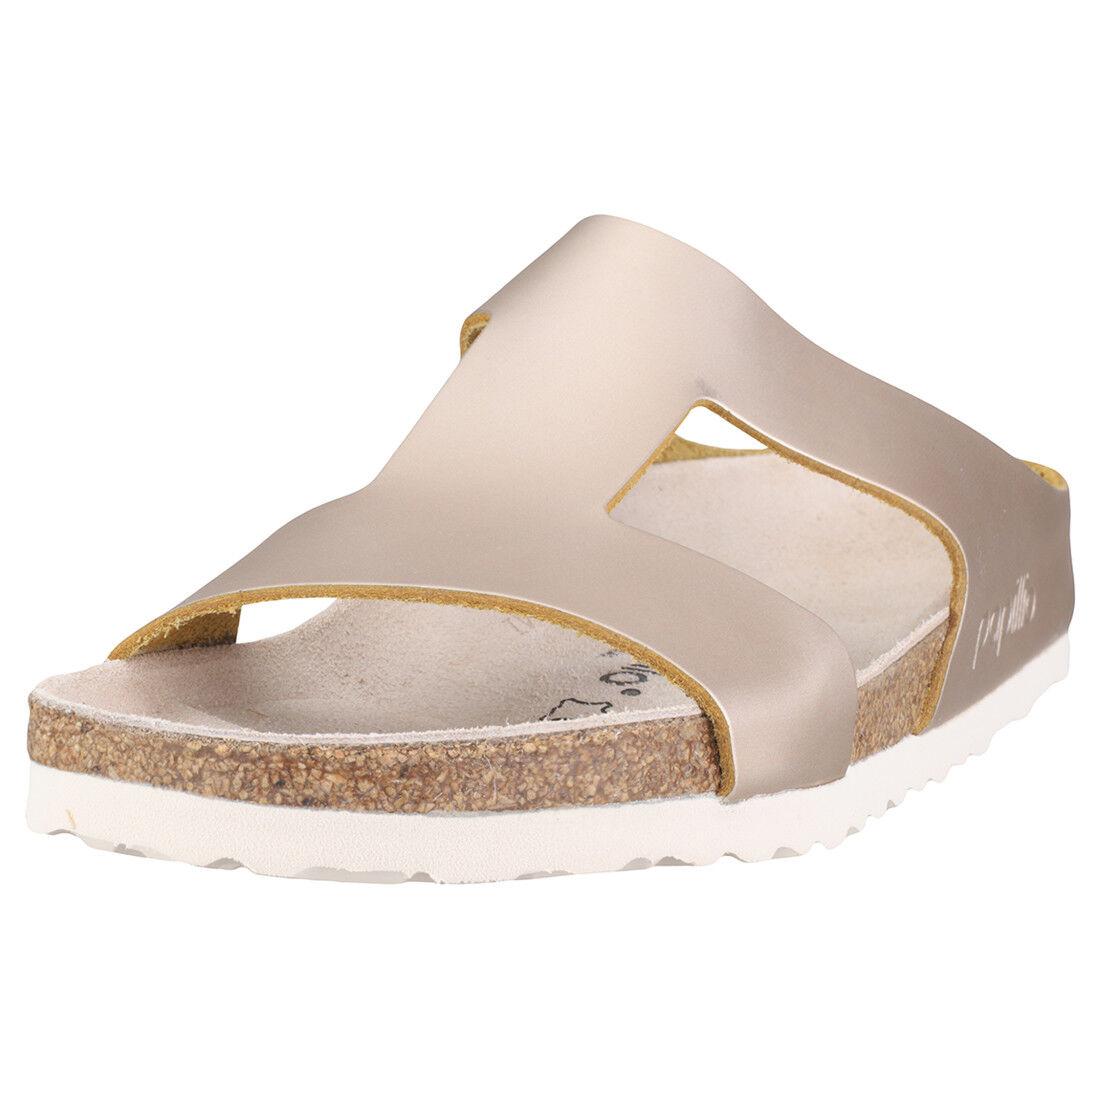 Birkenstock Charlize Papillio Narrow Fit Damen - Rose Gold Leder Sandalen - Damen 38 EU 66226d